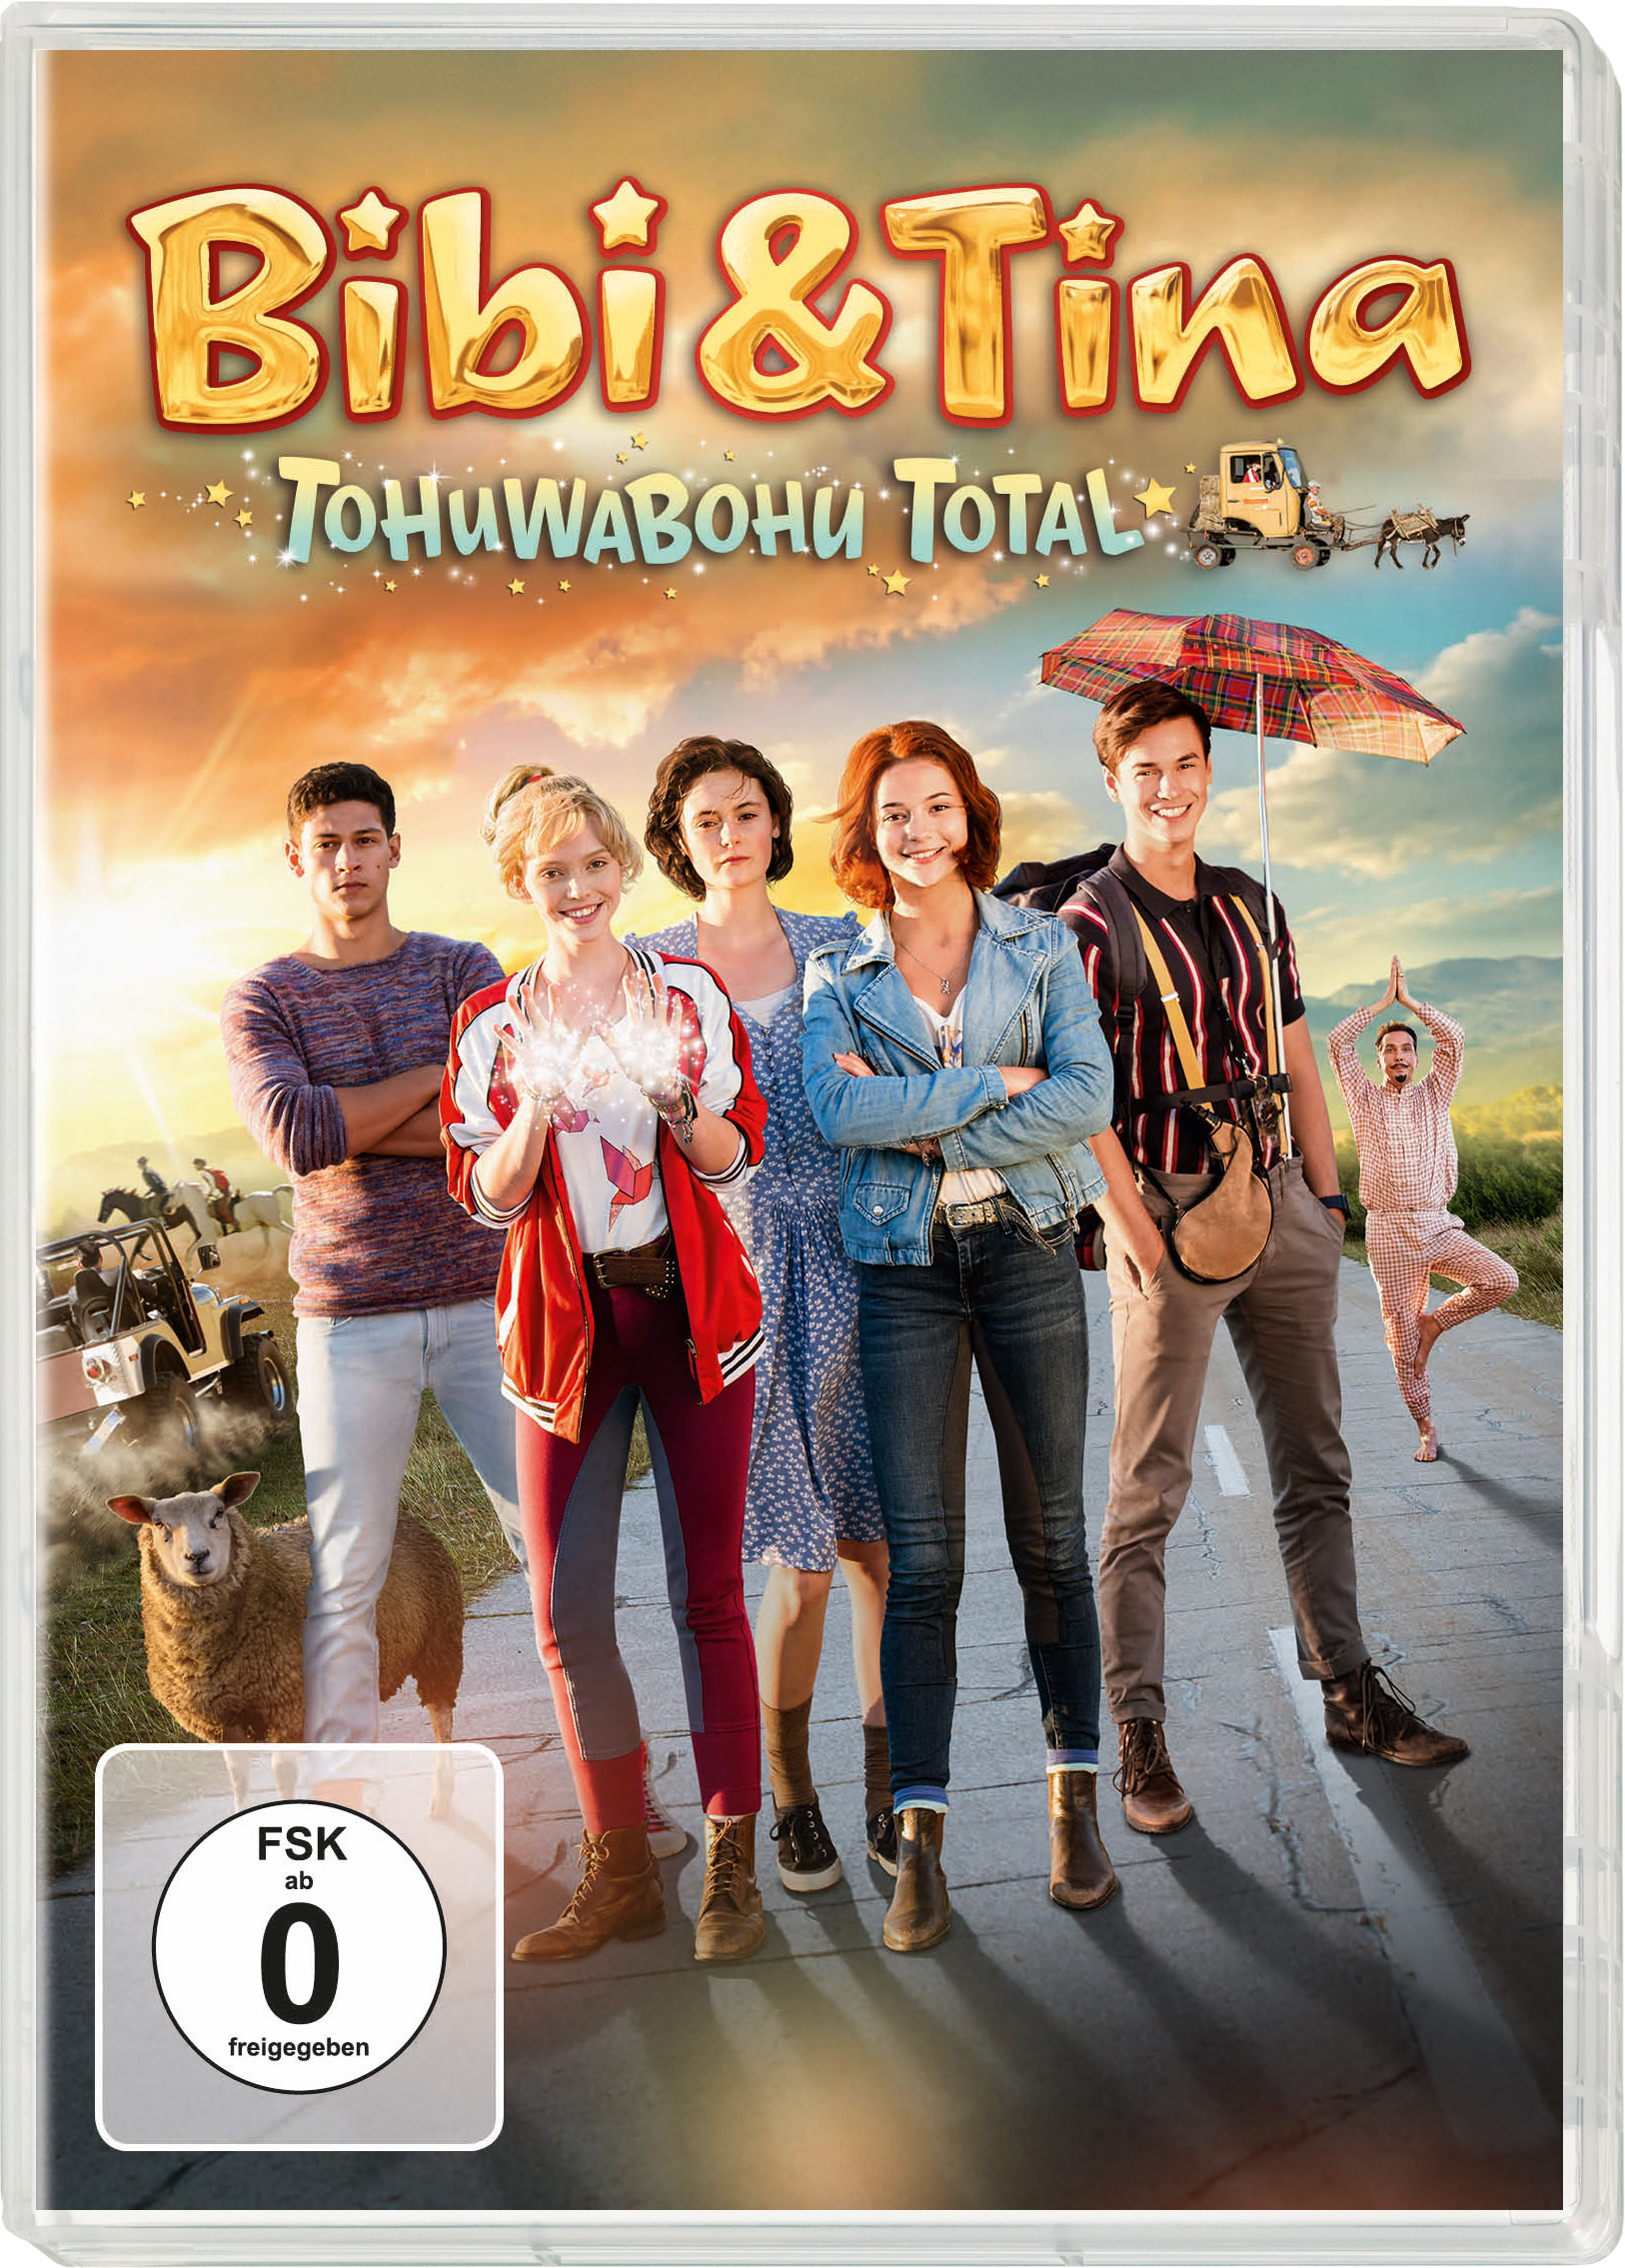 Bibi & Tina: Tohuwabohu total - Kinofilm 4